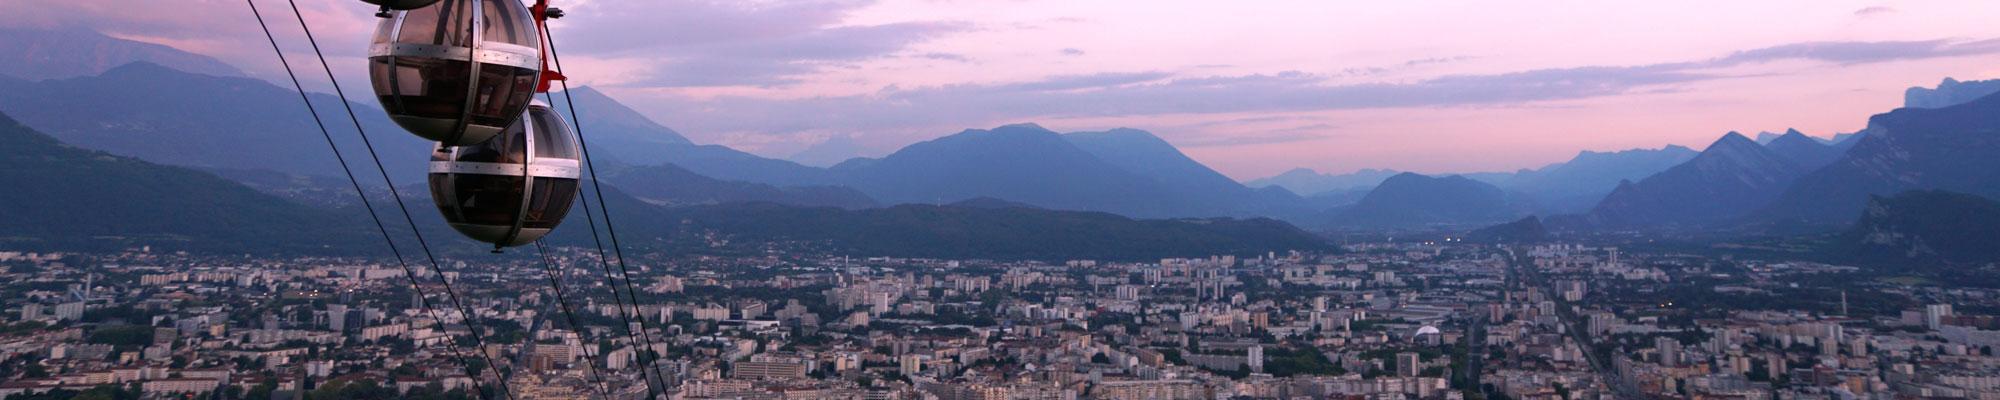 BTS à Grenoble / Alternance